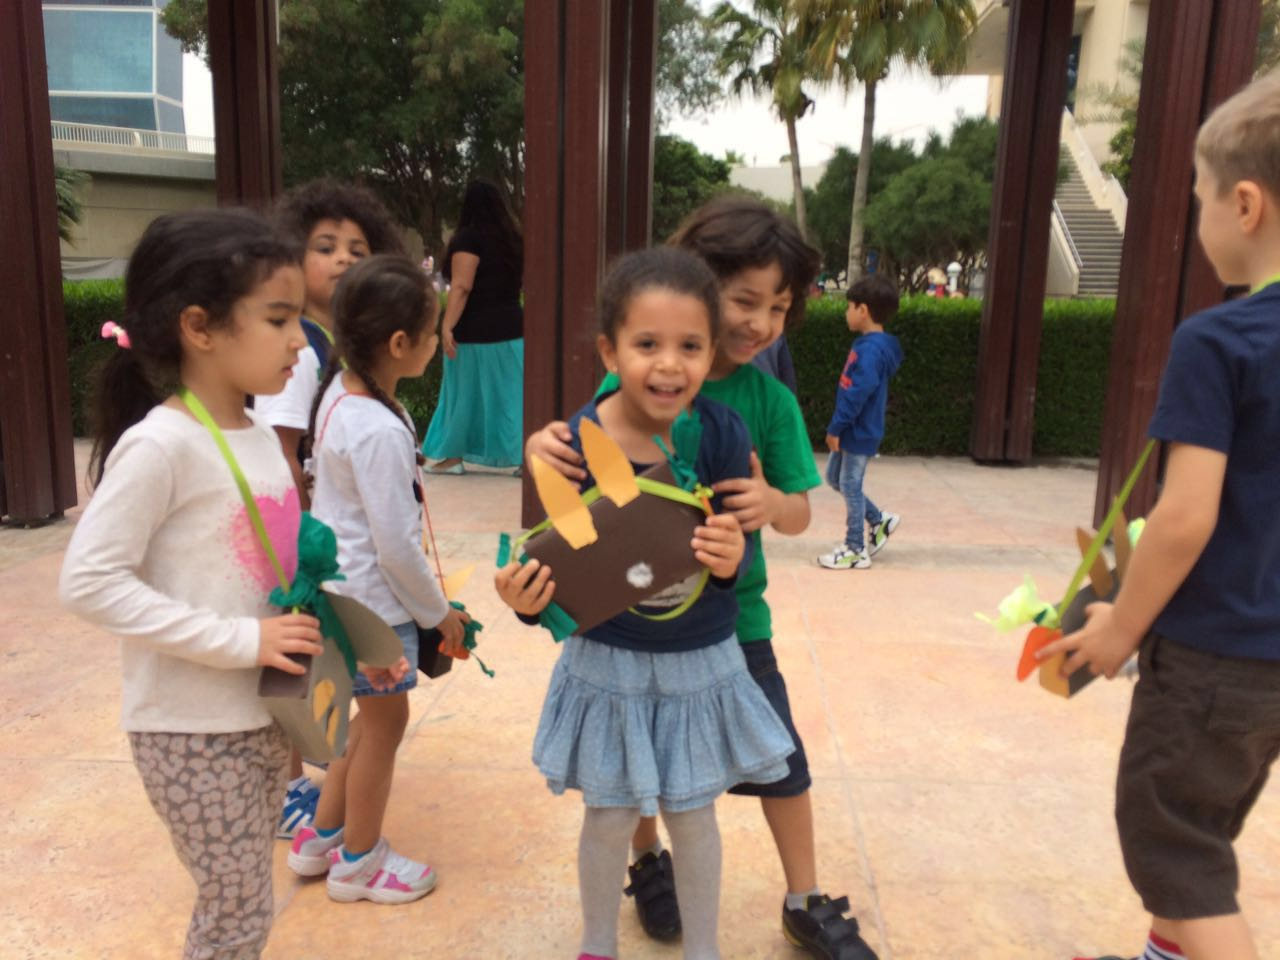 Bilder · Kindergarten Oster-Ausflug